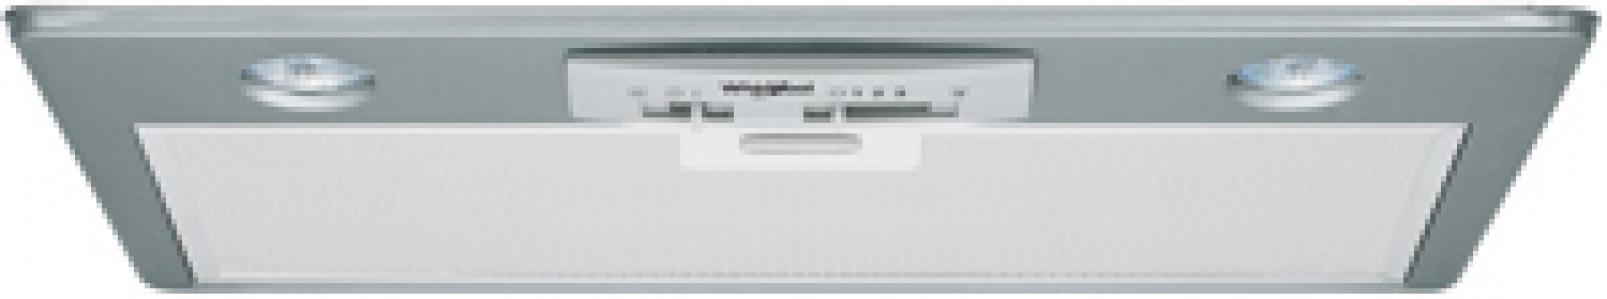 WHIRLPOOL AKR650/1IX - Groupe filtrant